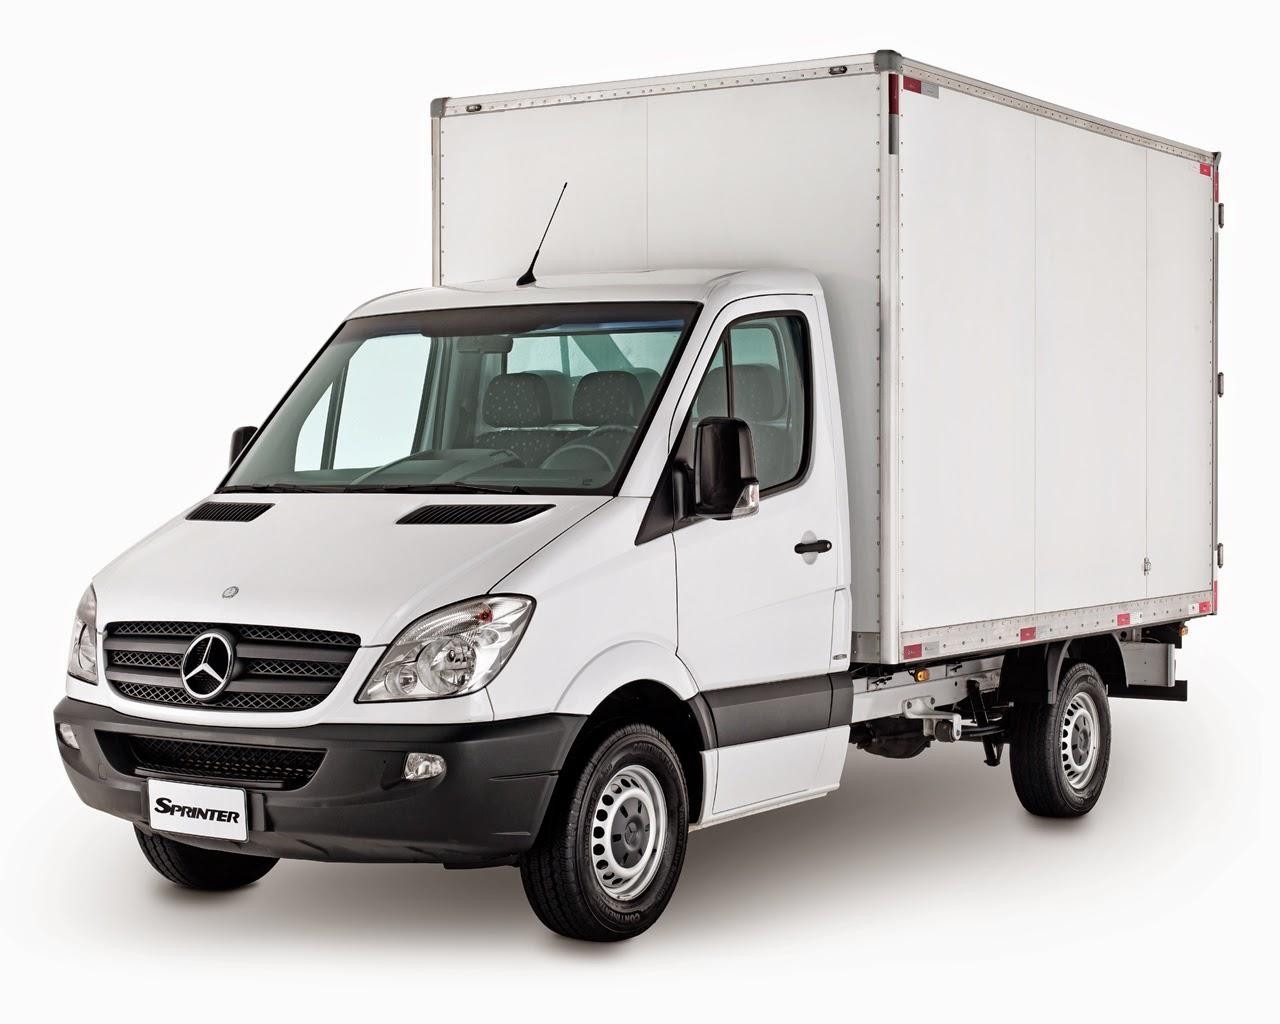 Mercedes benz destaca ve culos comerciais leves sprinter for Garage mercedes loison sous lens